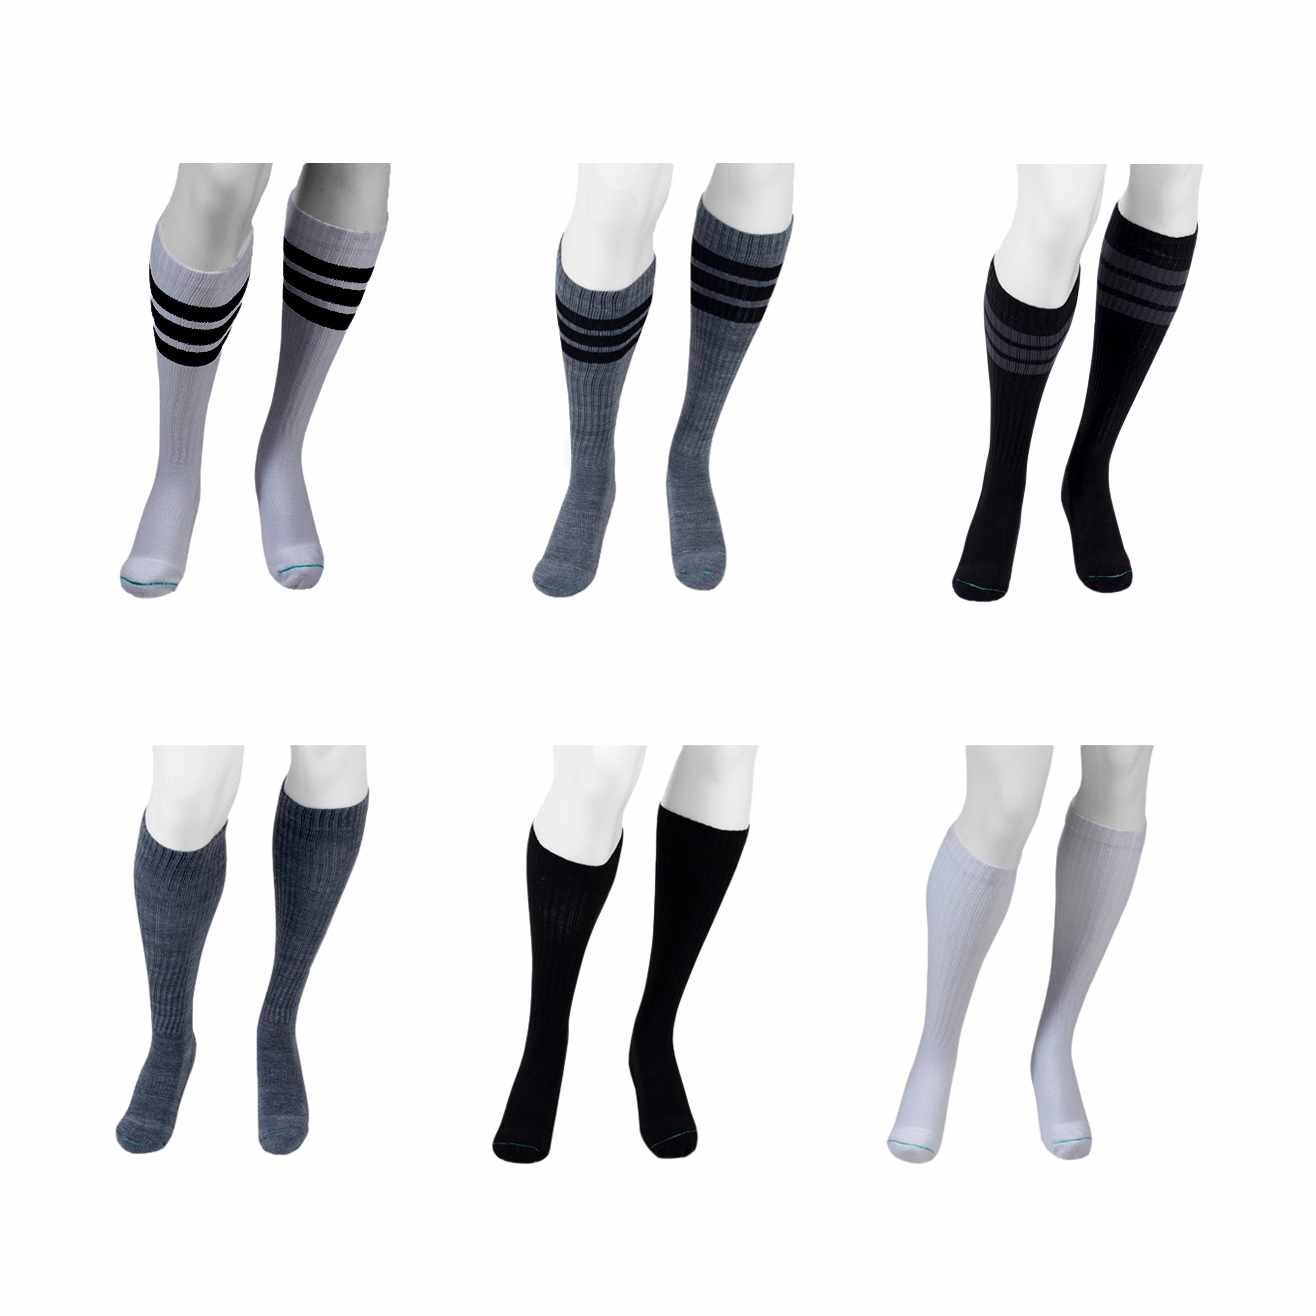 Juzo Power Comfort Knee-High Compression Socks